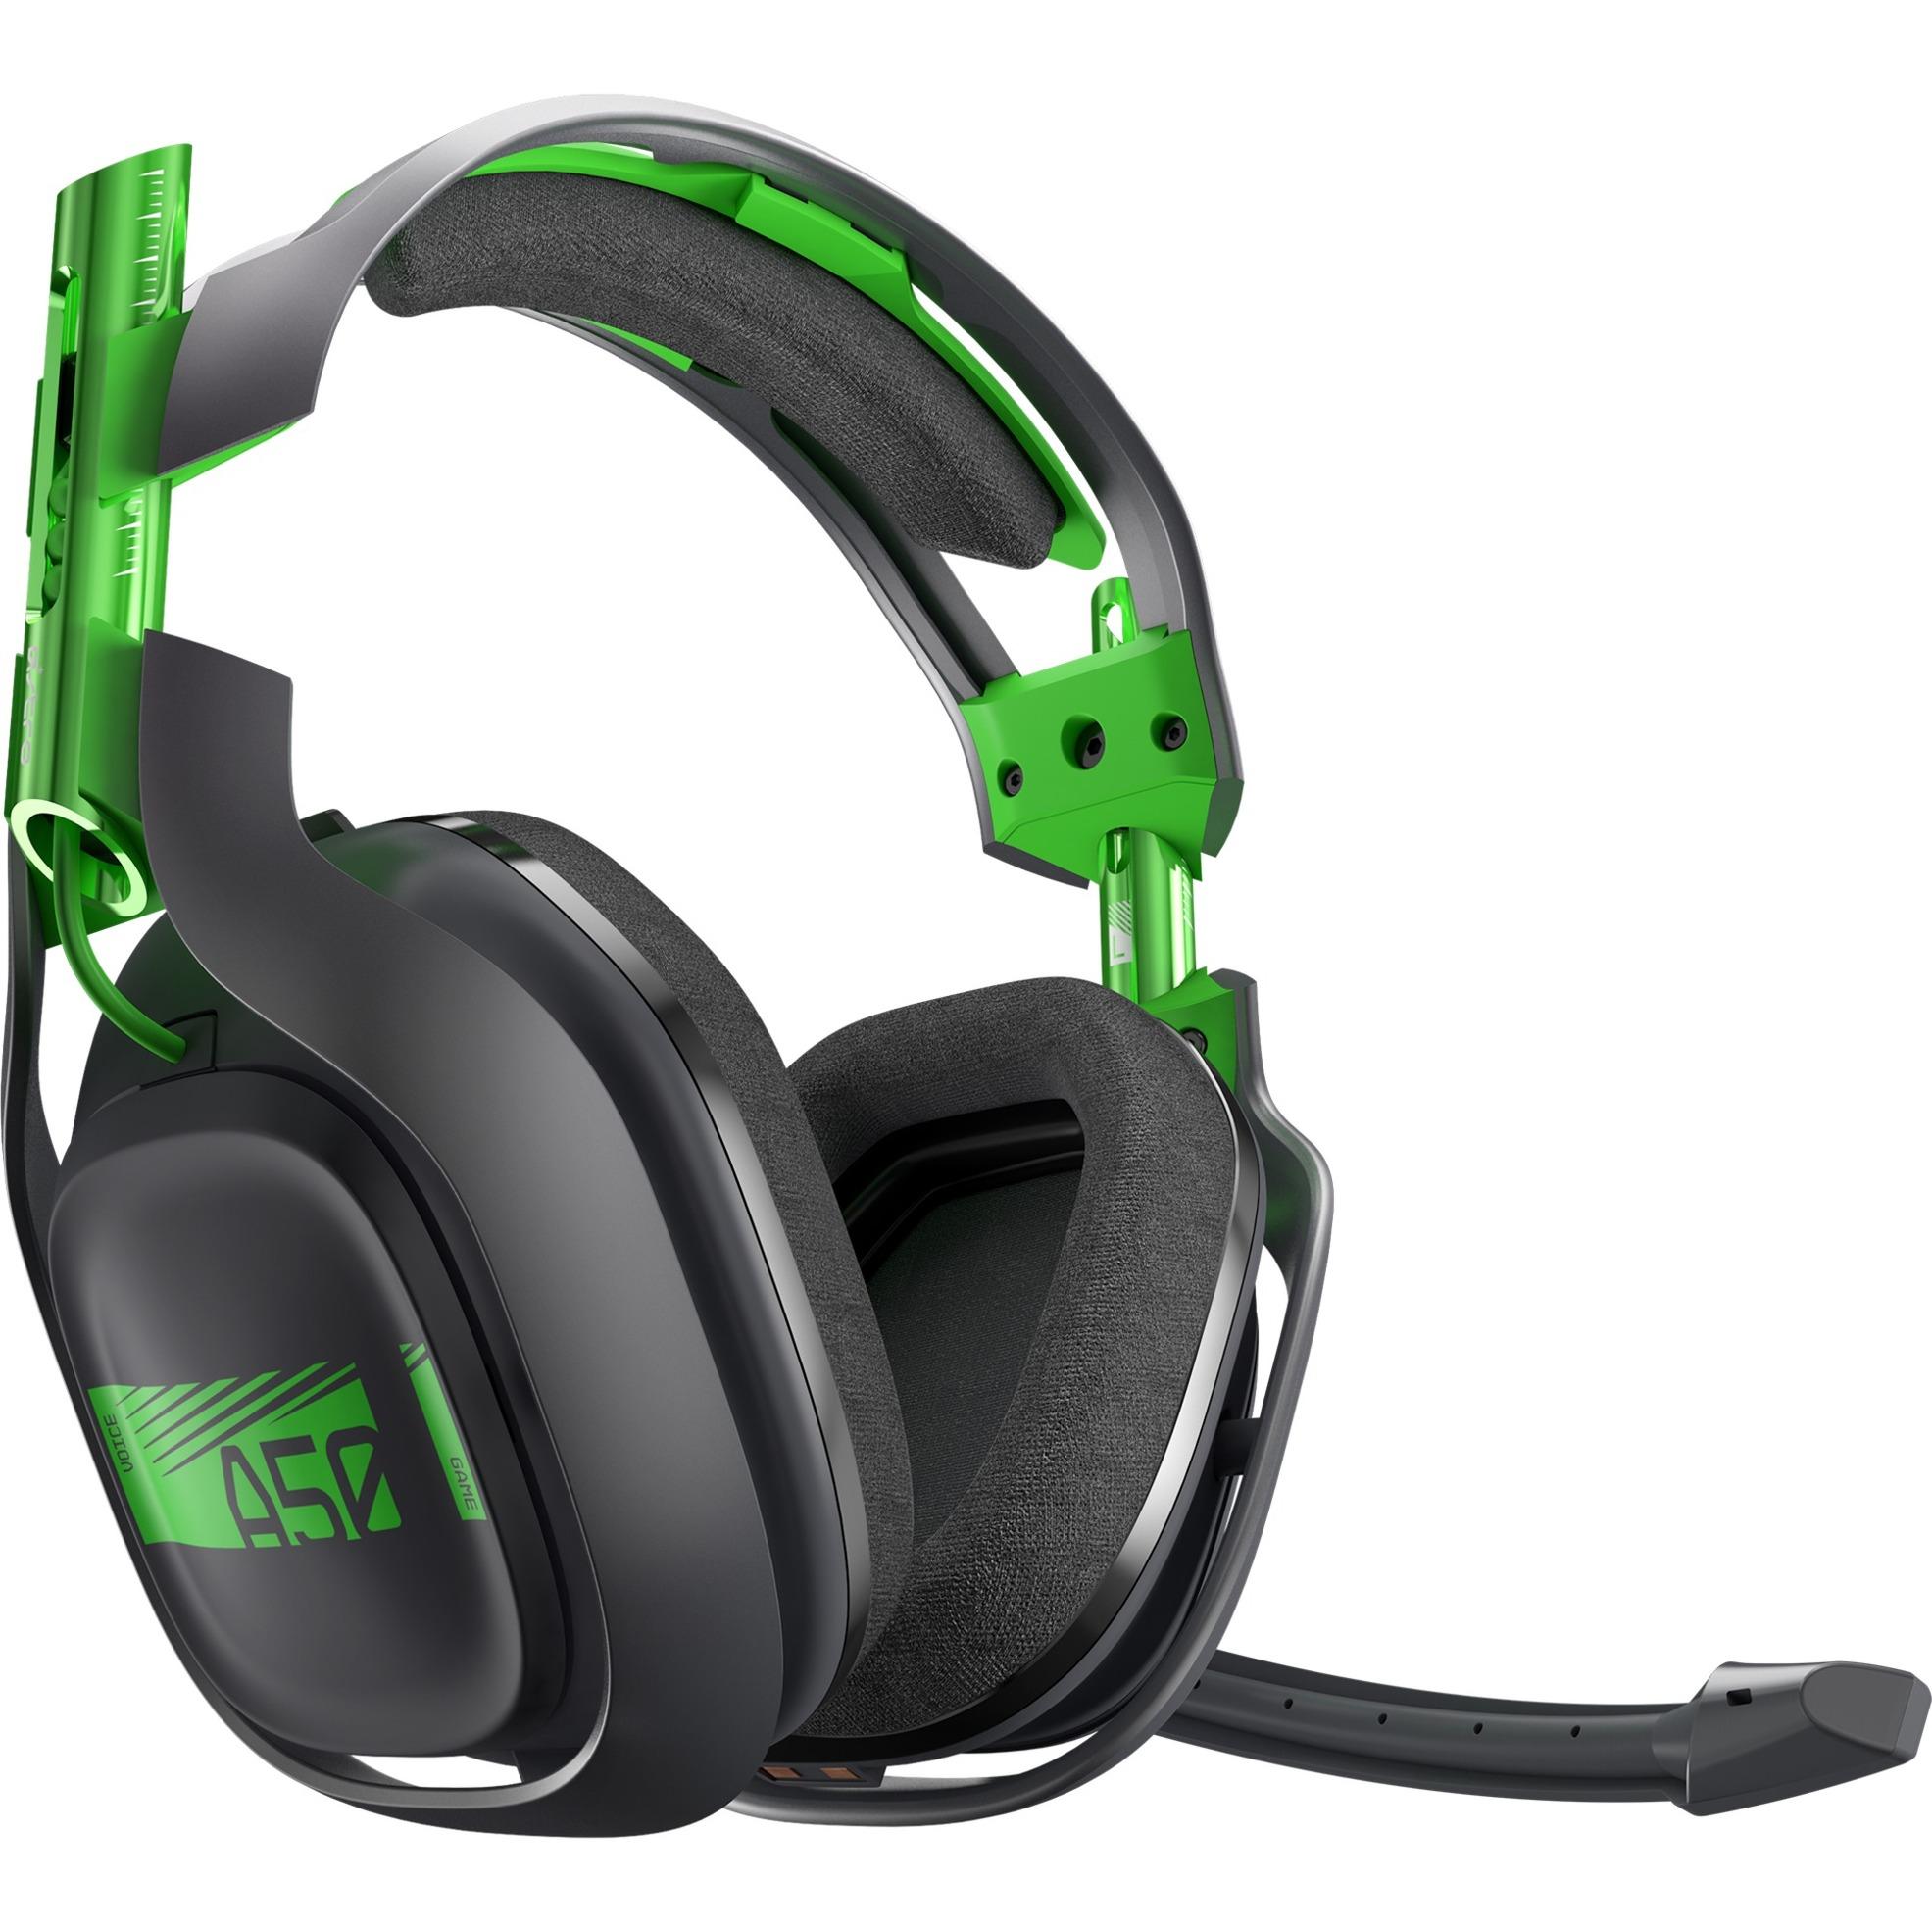 A50 Wireless Binaurale Diadema Verde, Gris auricular con micrófono, Auriculares con micrófono